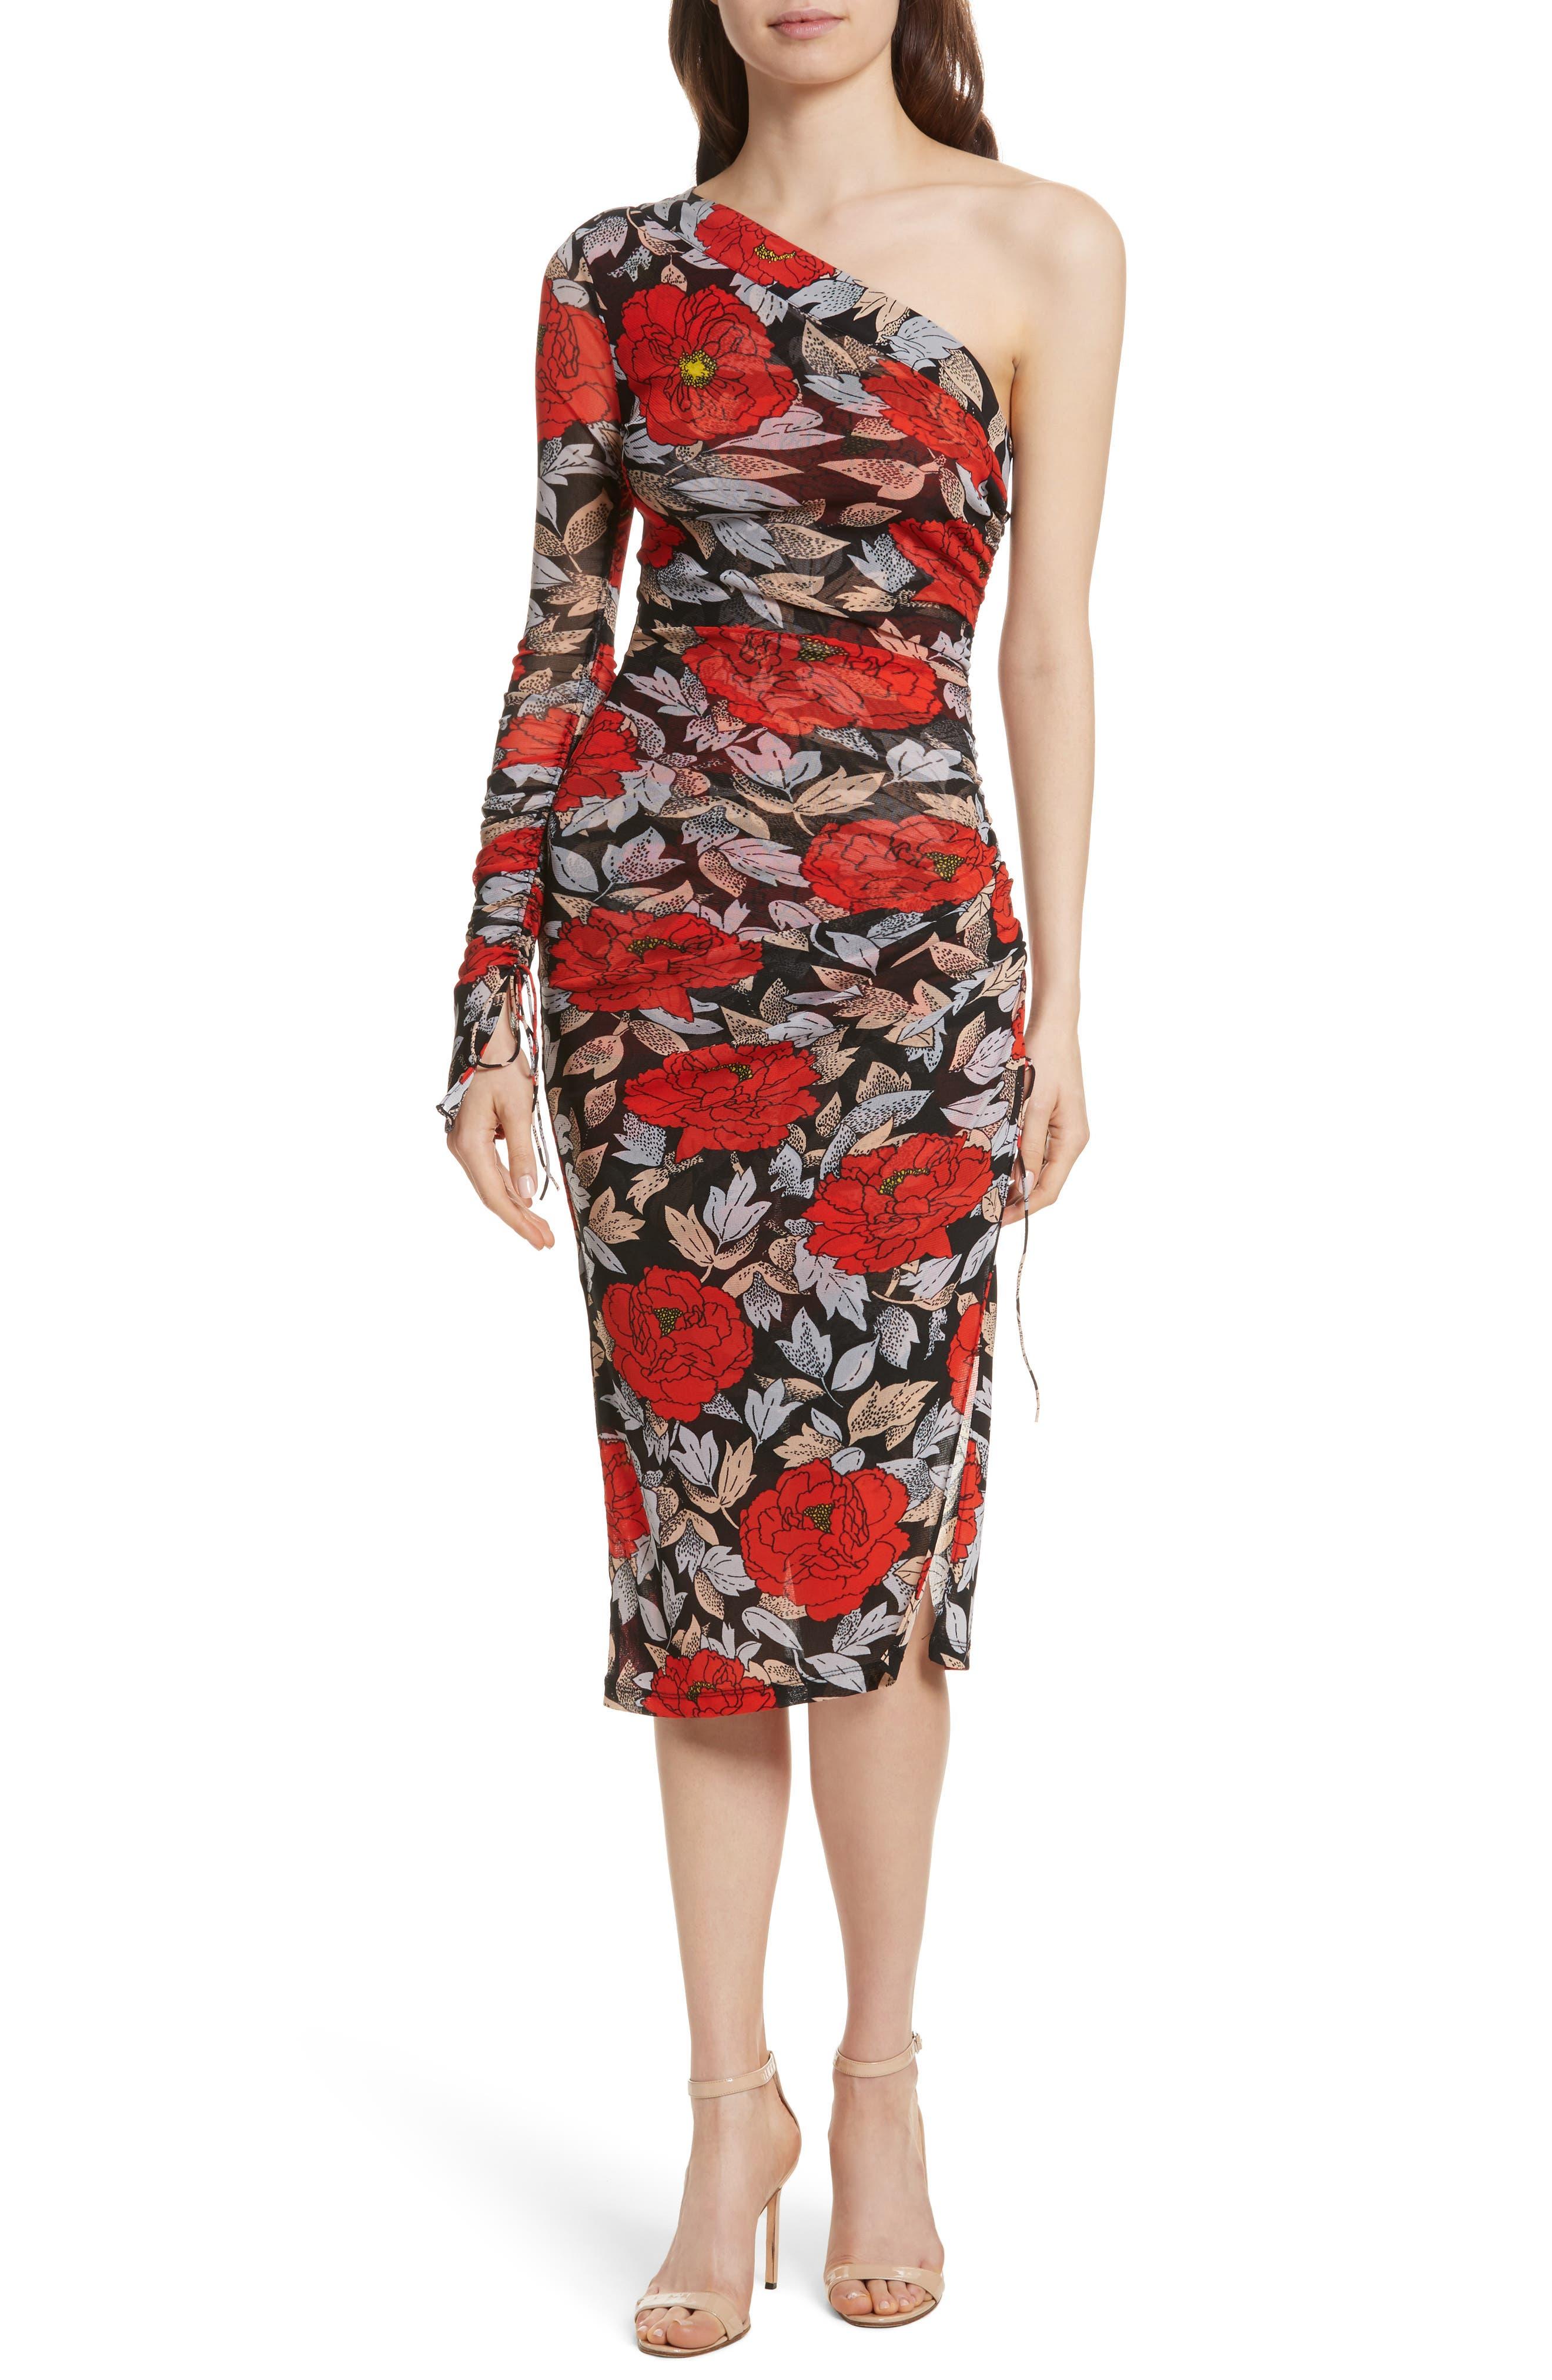 Diane von Furstenberg Ruched One-Shoulder Dress,                             Main thumbnail 1, color,                             601